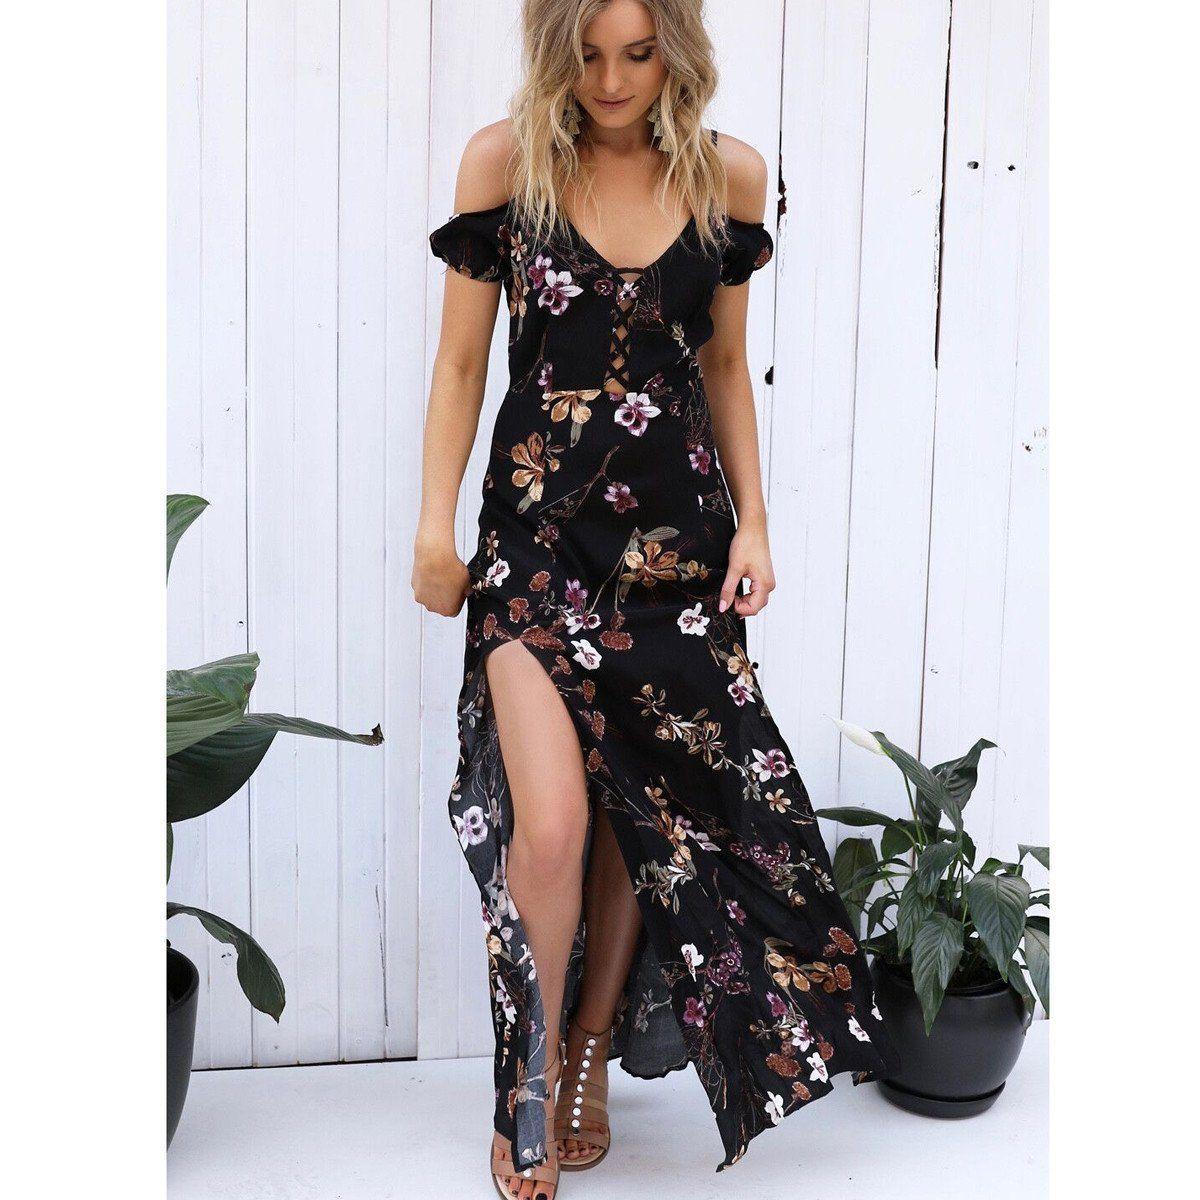 Spaghetti strap vneck bear shoulder floral print split long dress